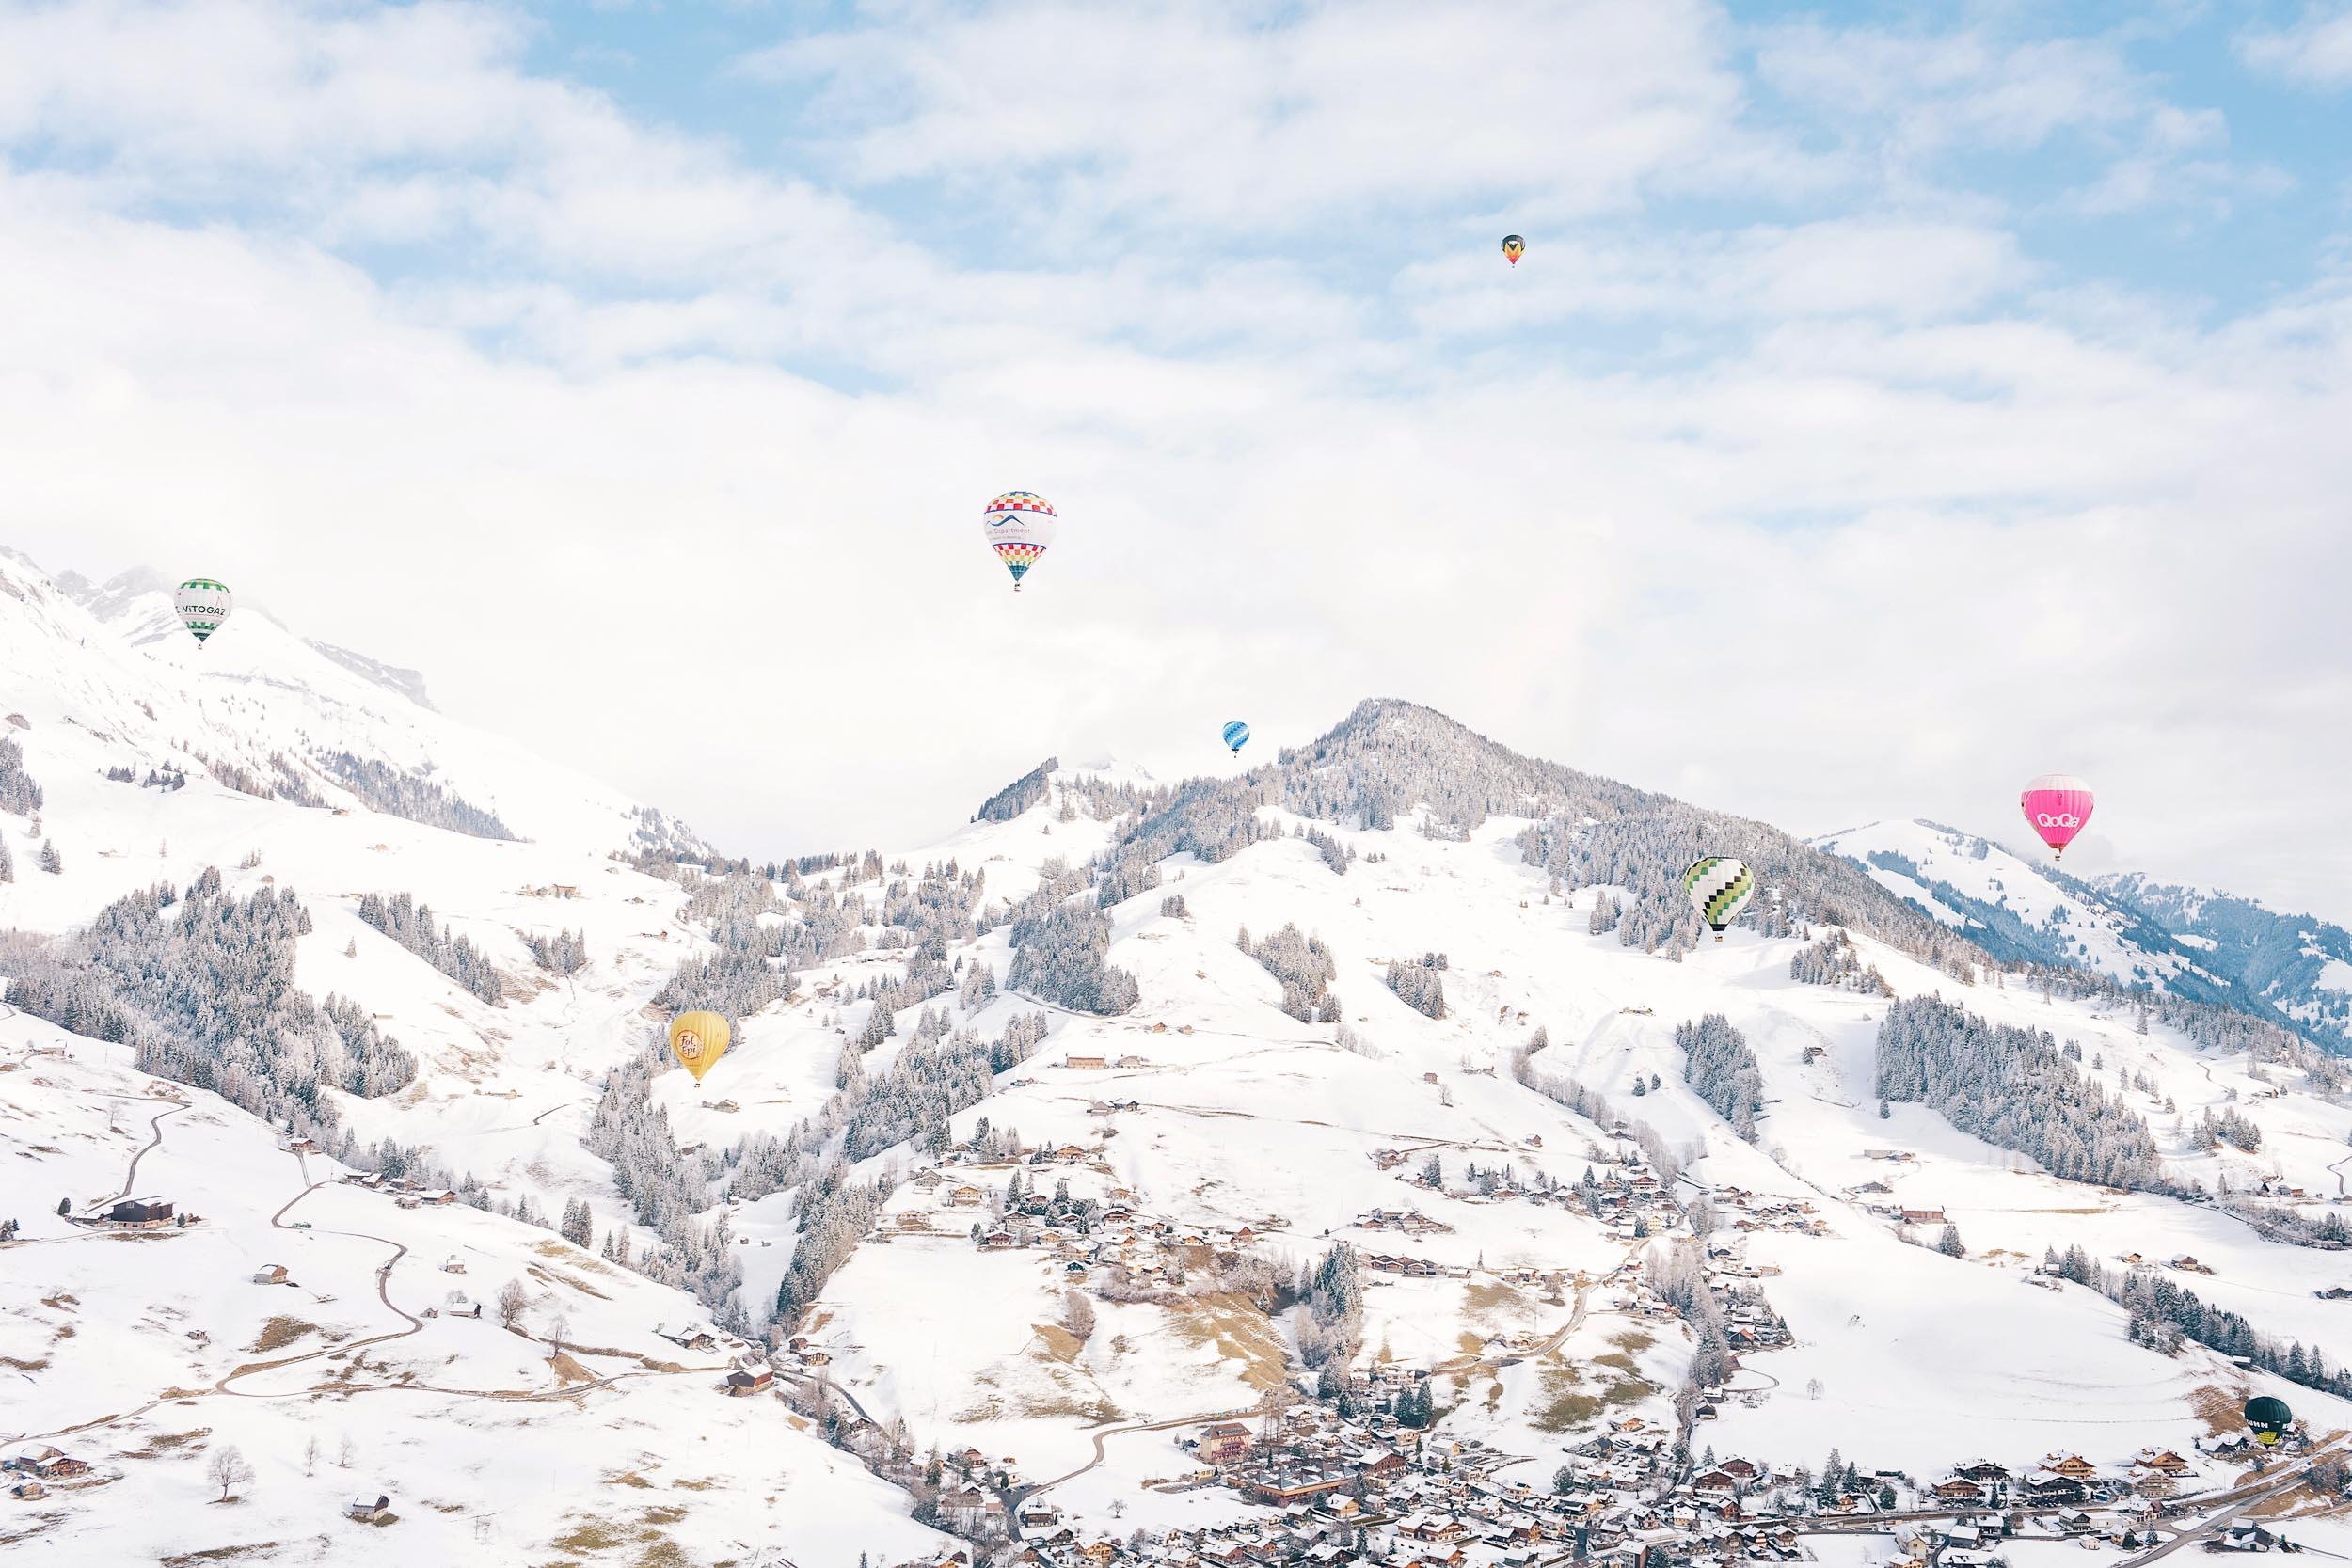 A winter hot air balloon ride in Switzerland